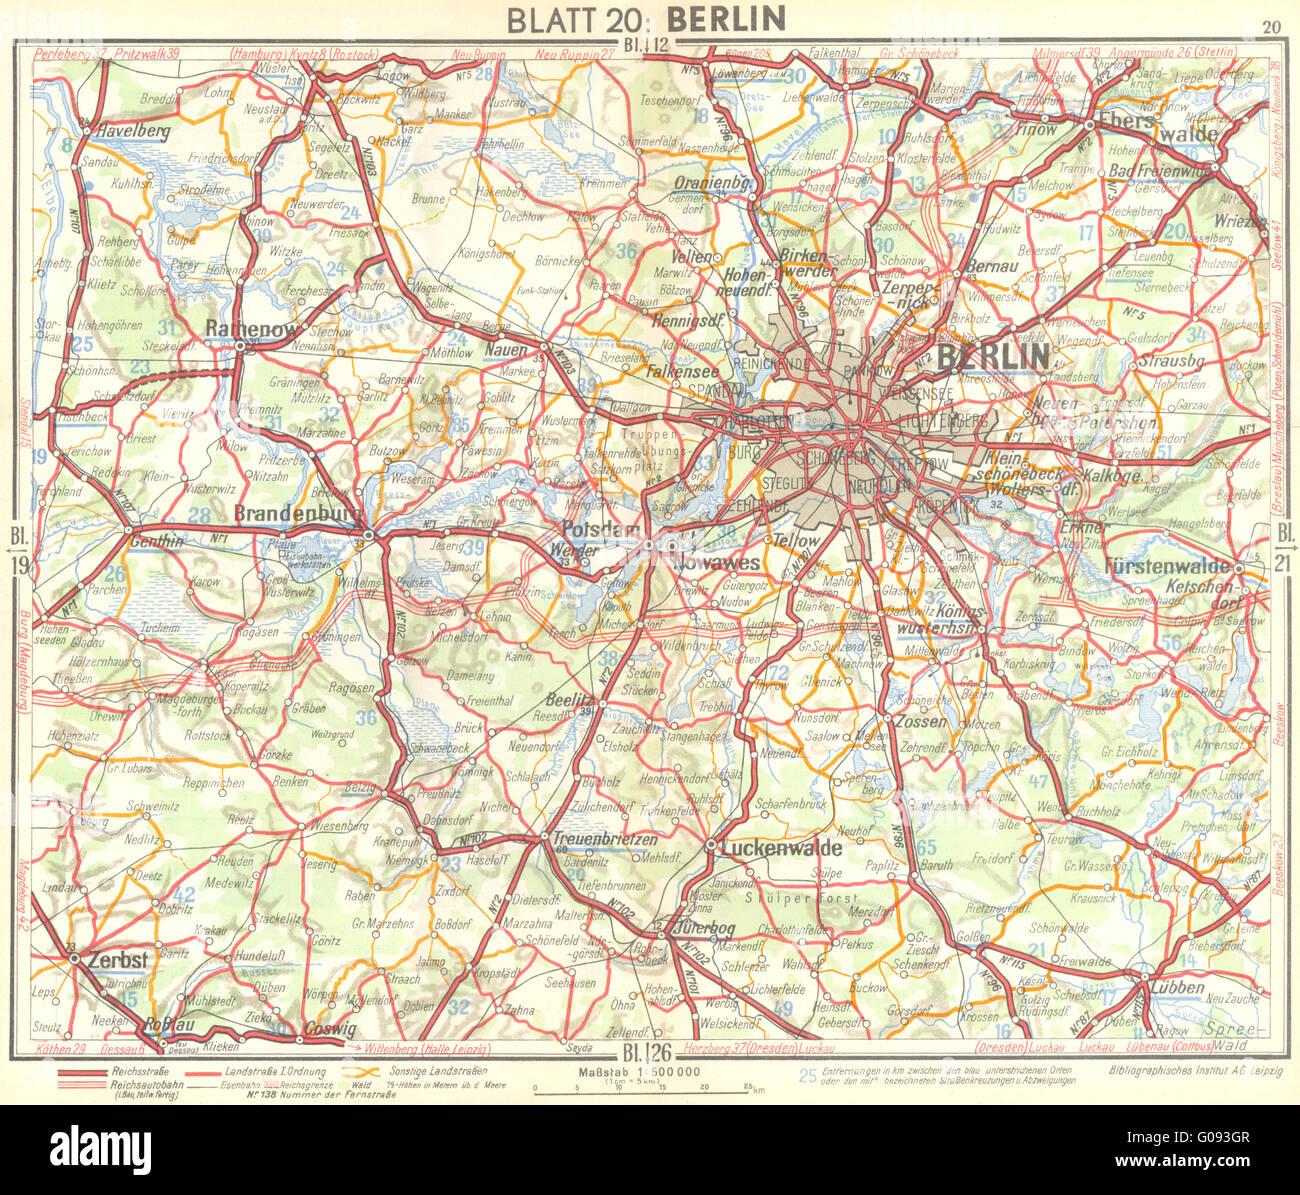 Germany Map Berlin.Berlin Map Stock Photos Berlin Map Stock Images Alamy